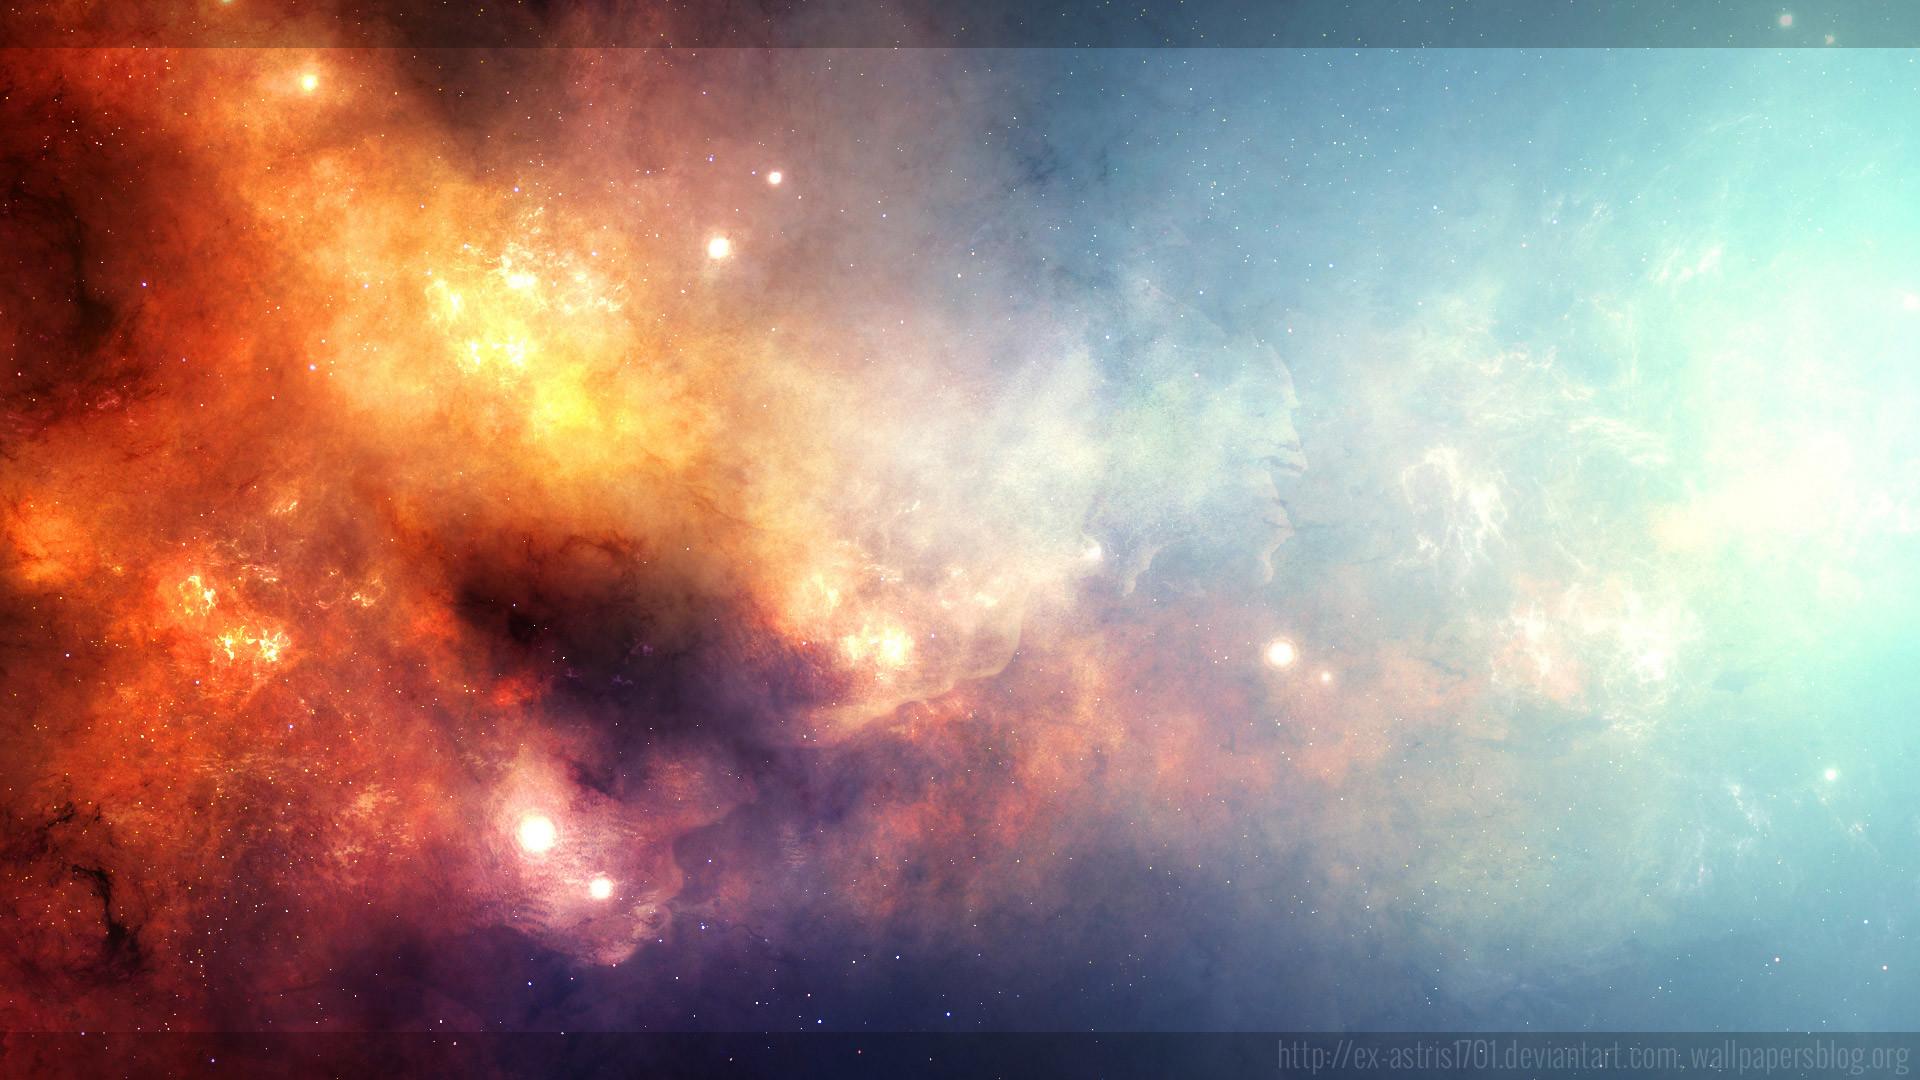 Space | Full HD Wallpapers, download 1080p desktop backgrounds